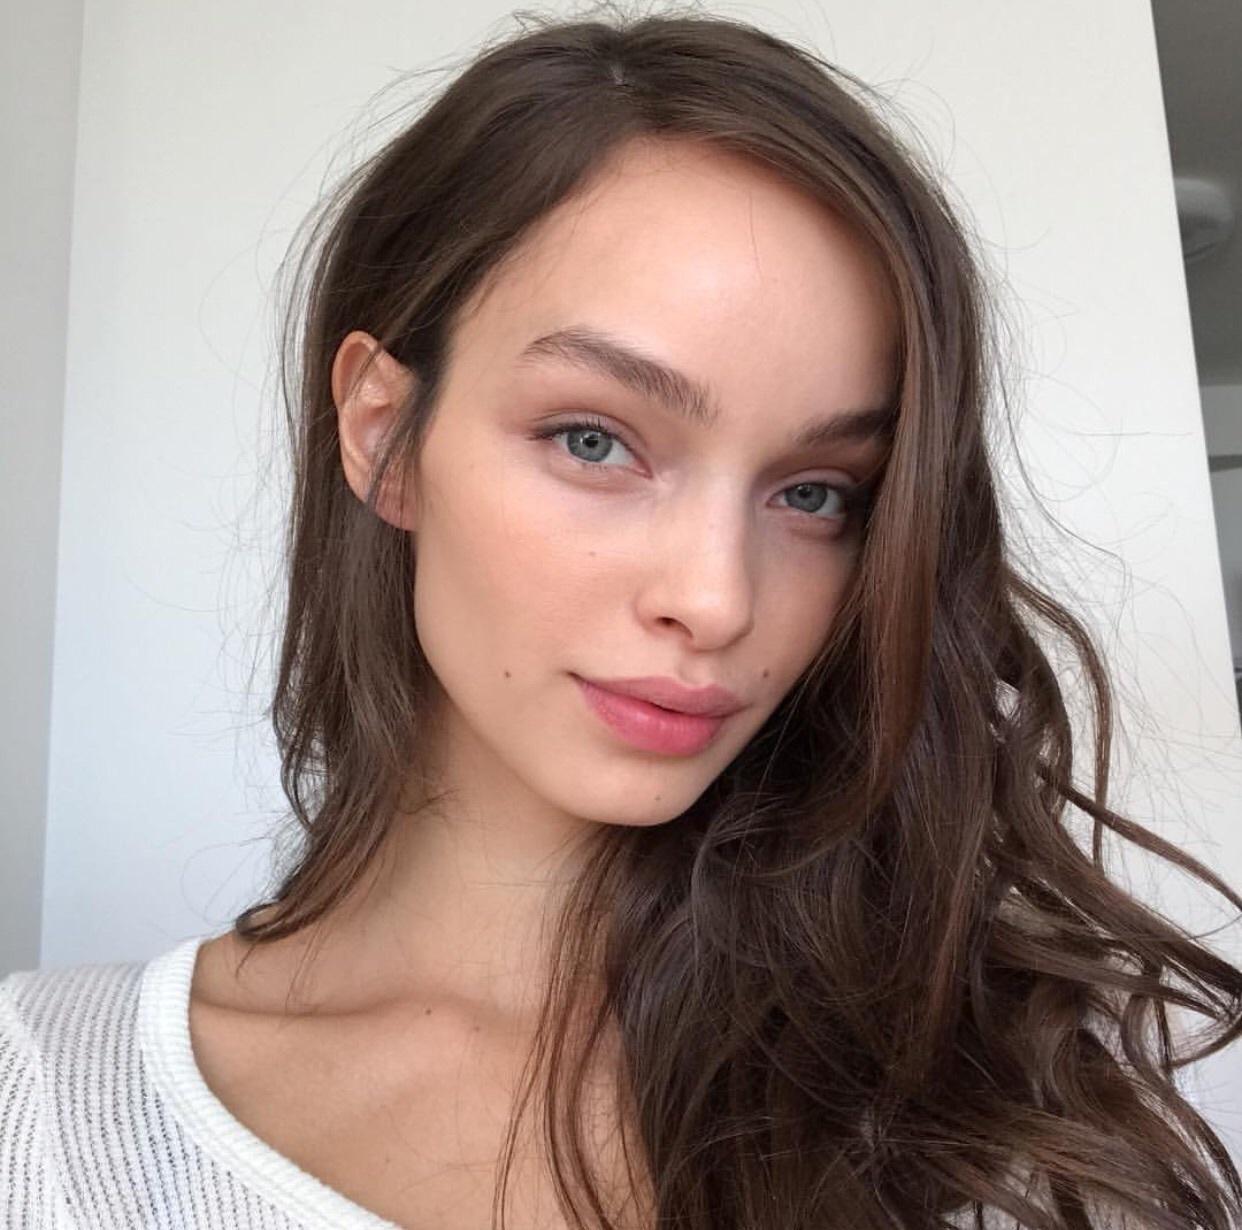 Selfie Luma Grothe nude (54 photos), Pussy, Sideboobs, Selfie, bra 2019